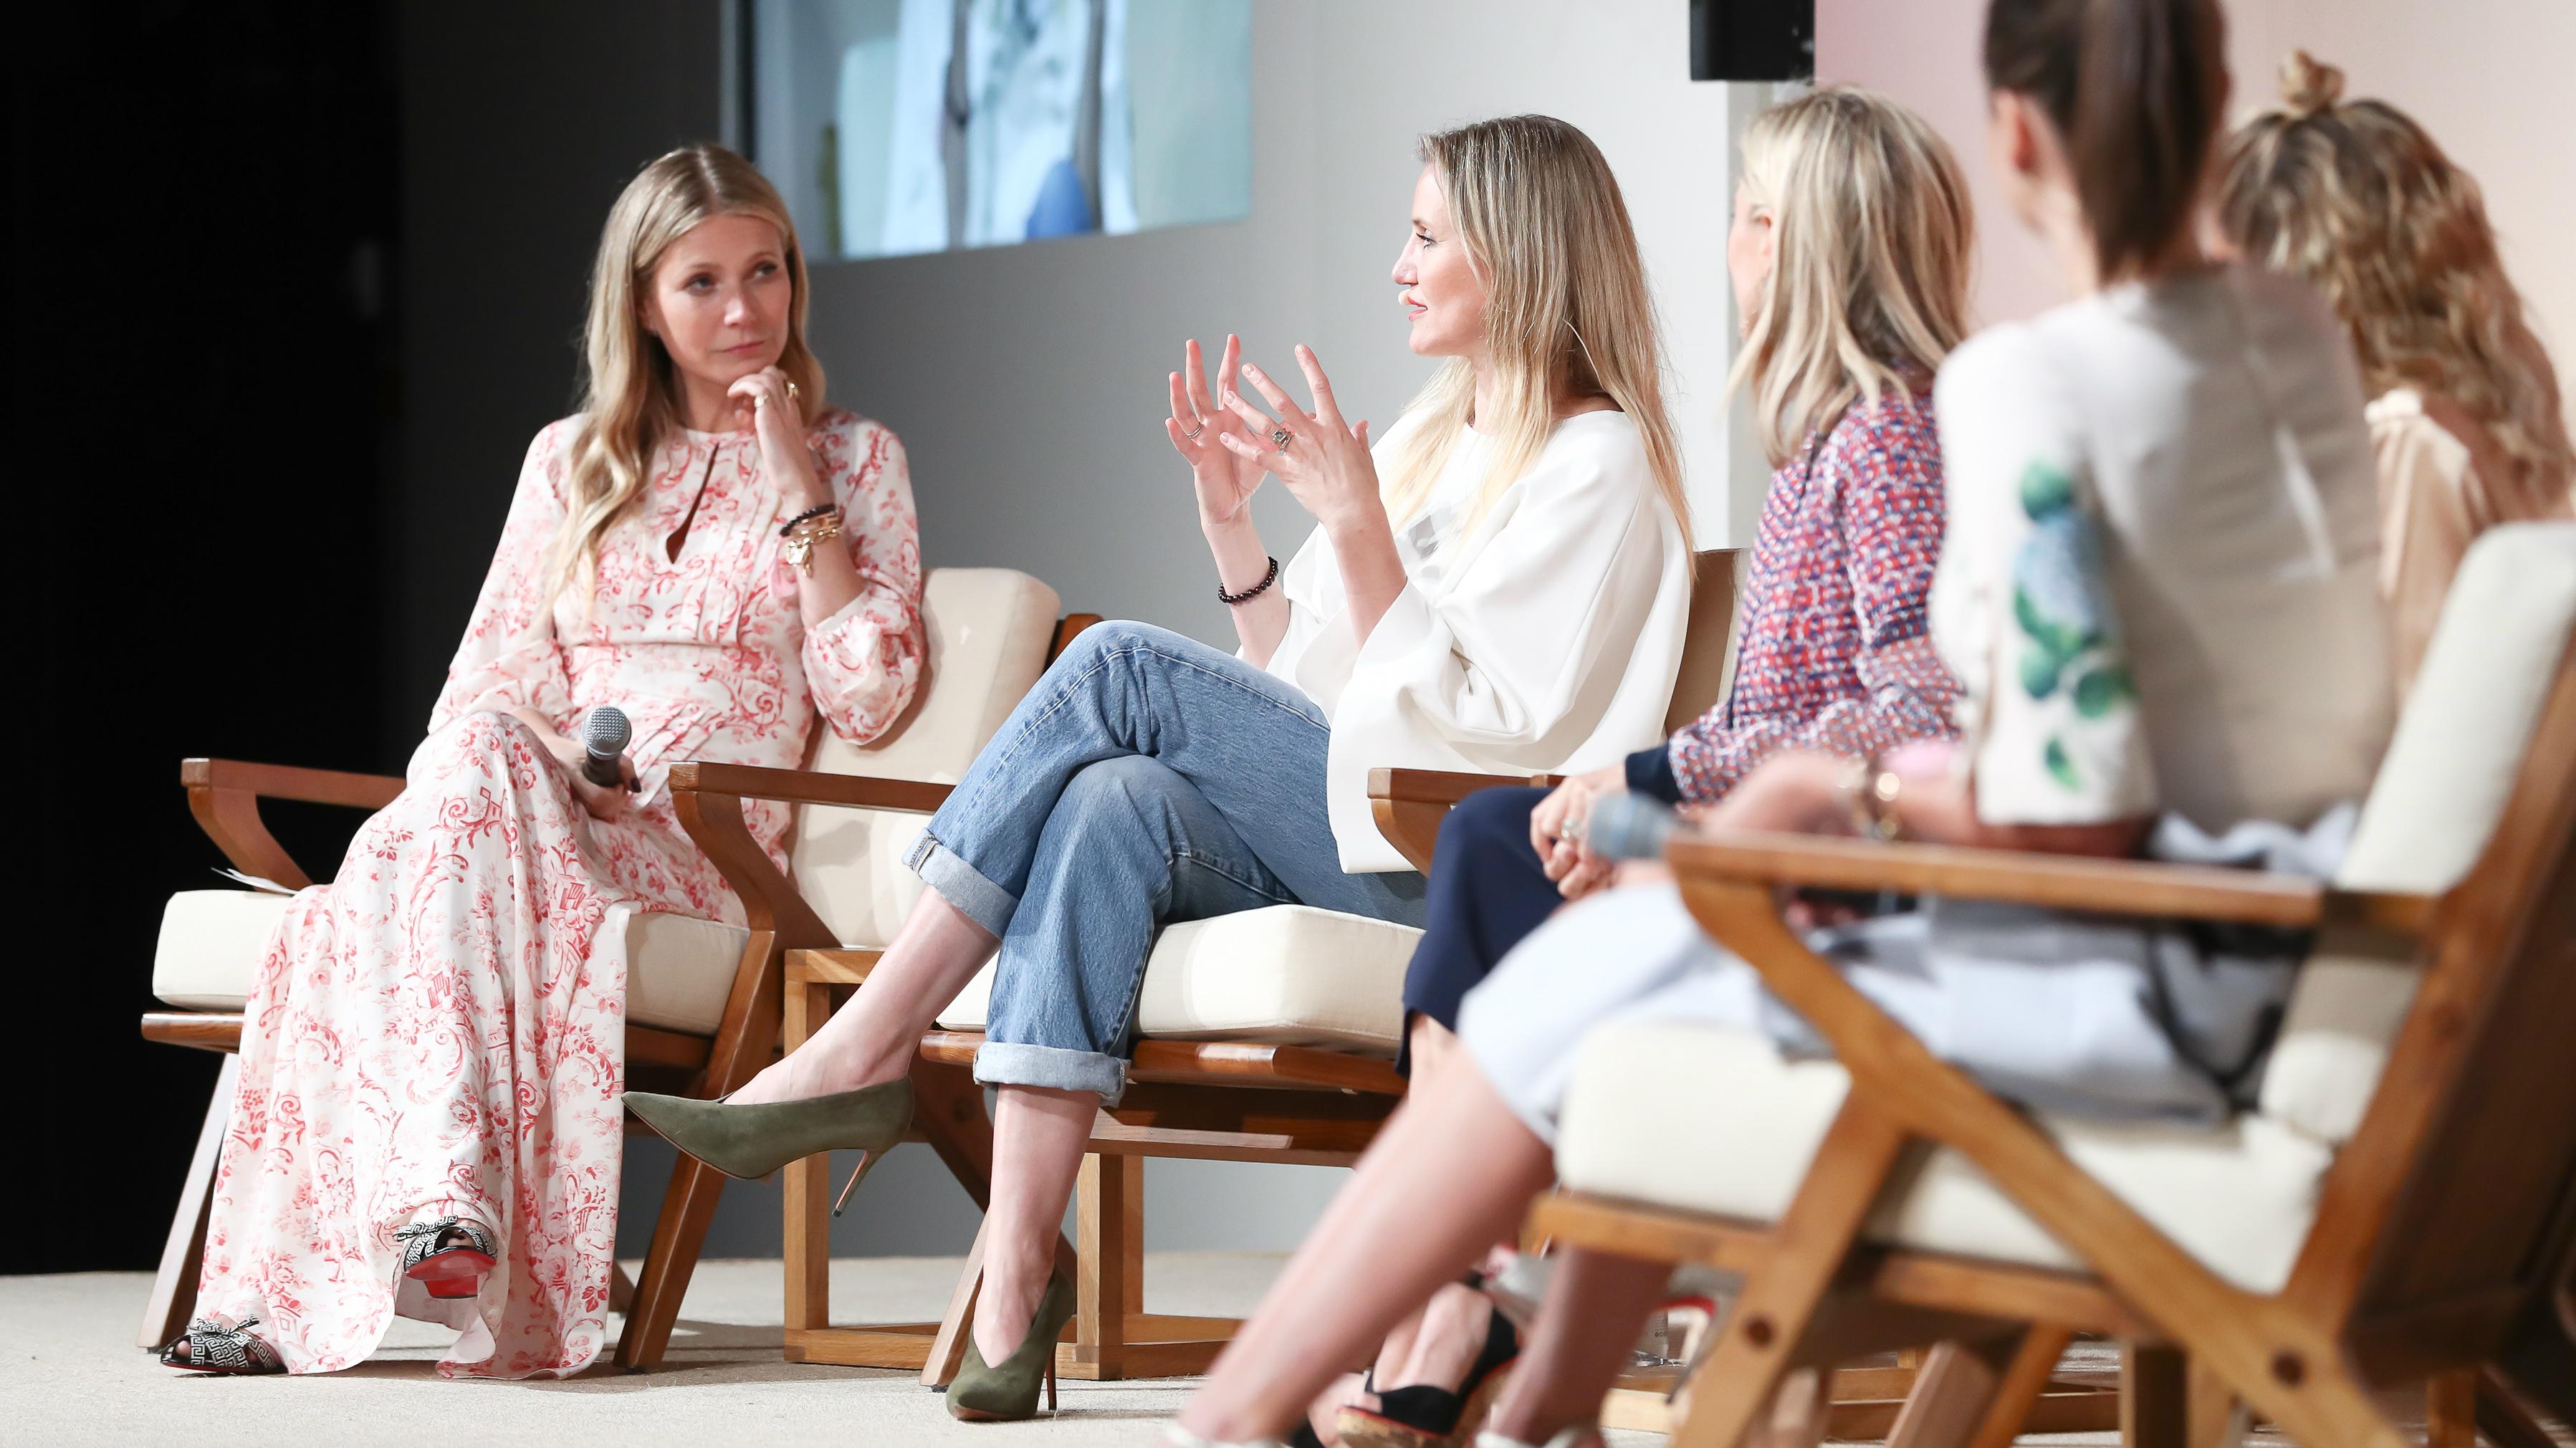 Gwyneth Paltrow consults with Cameron Diaz, Tory Burch, Nicole Richie, and  Miranda Kerr. (BFA/John Salangsang)